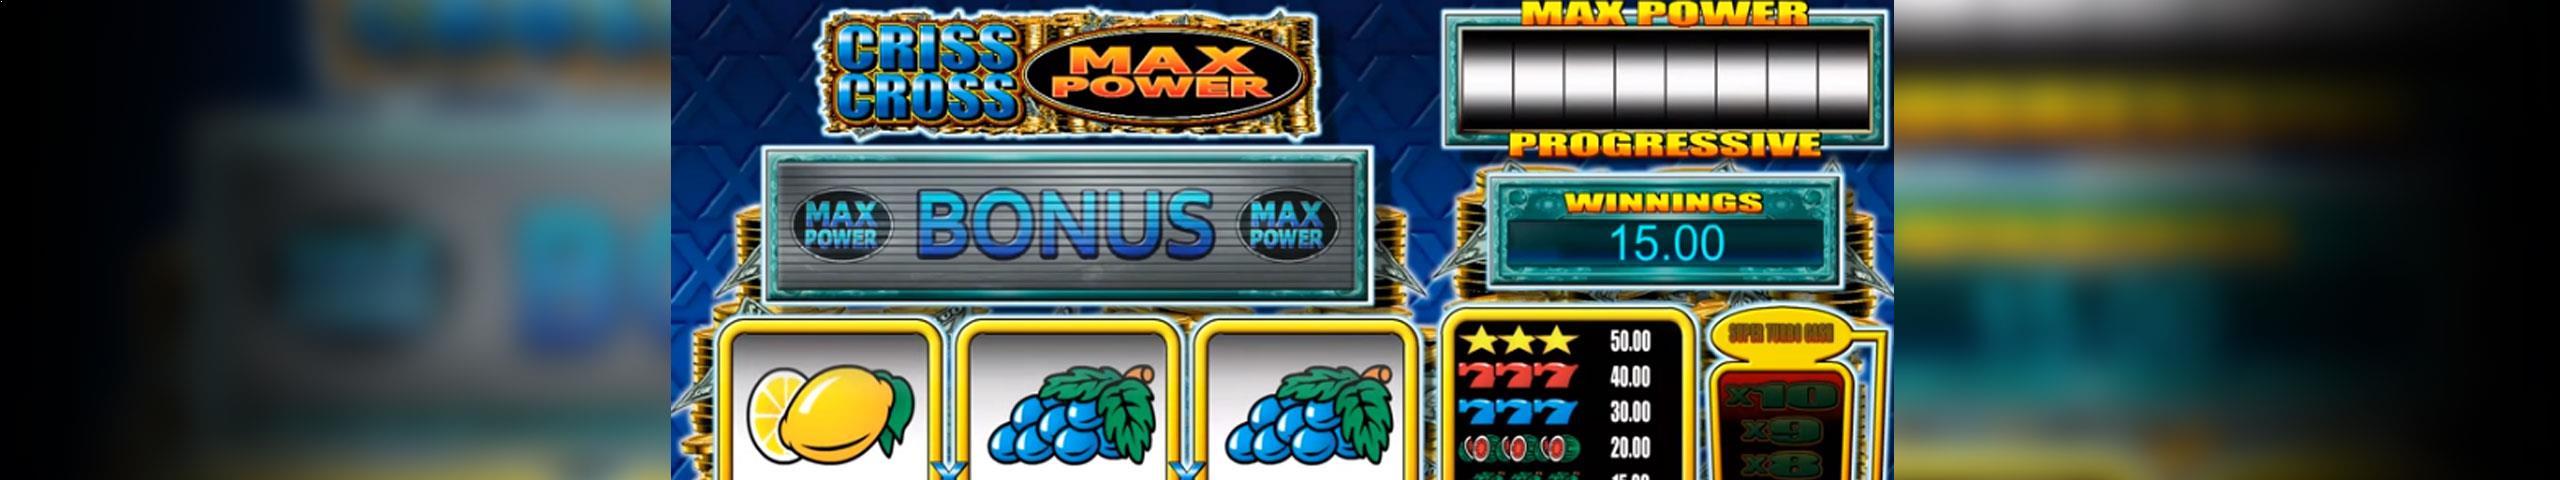 Criss Cross Max Power Microgaming jocuri slot slider